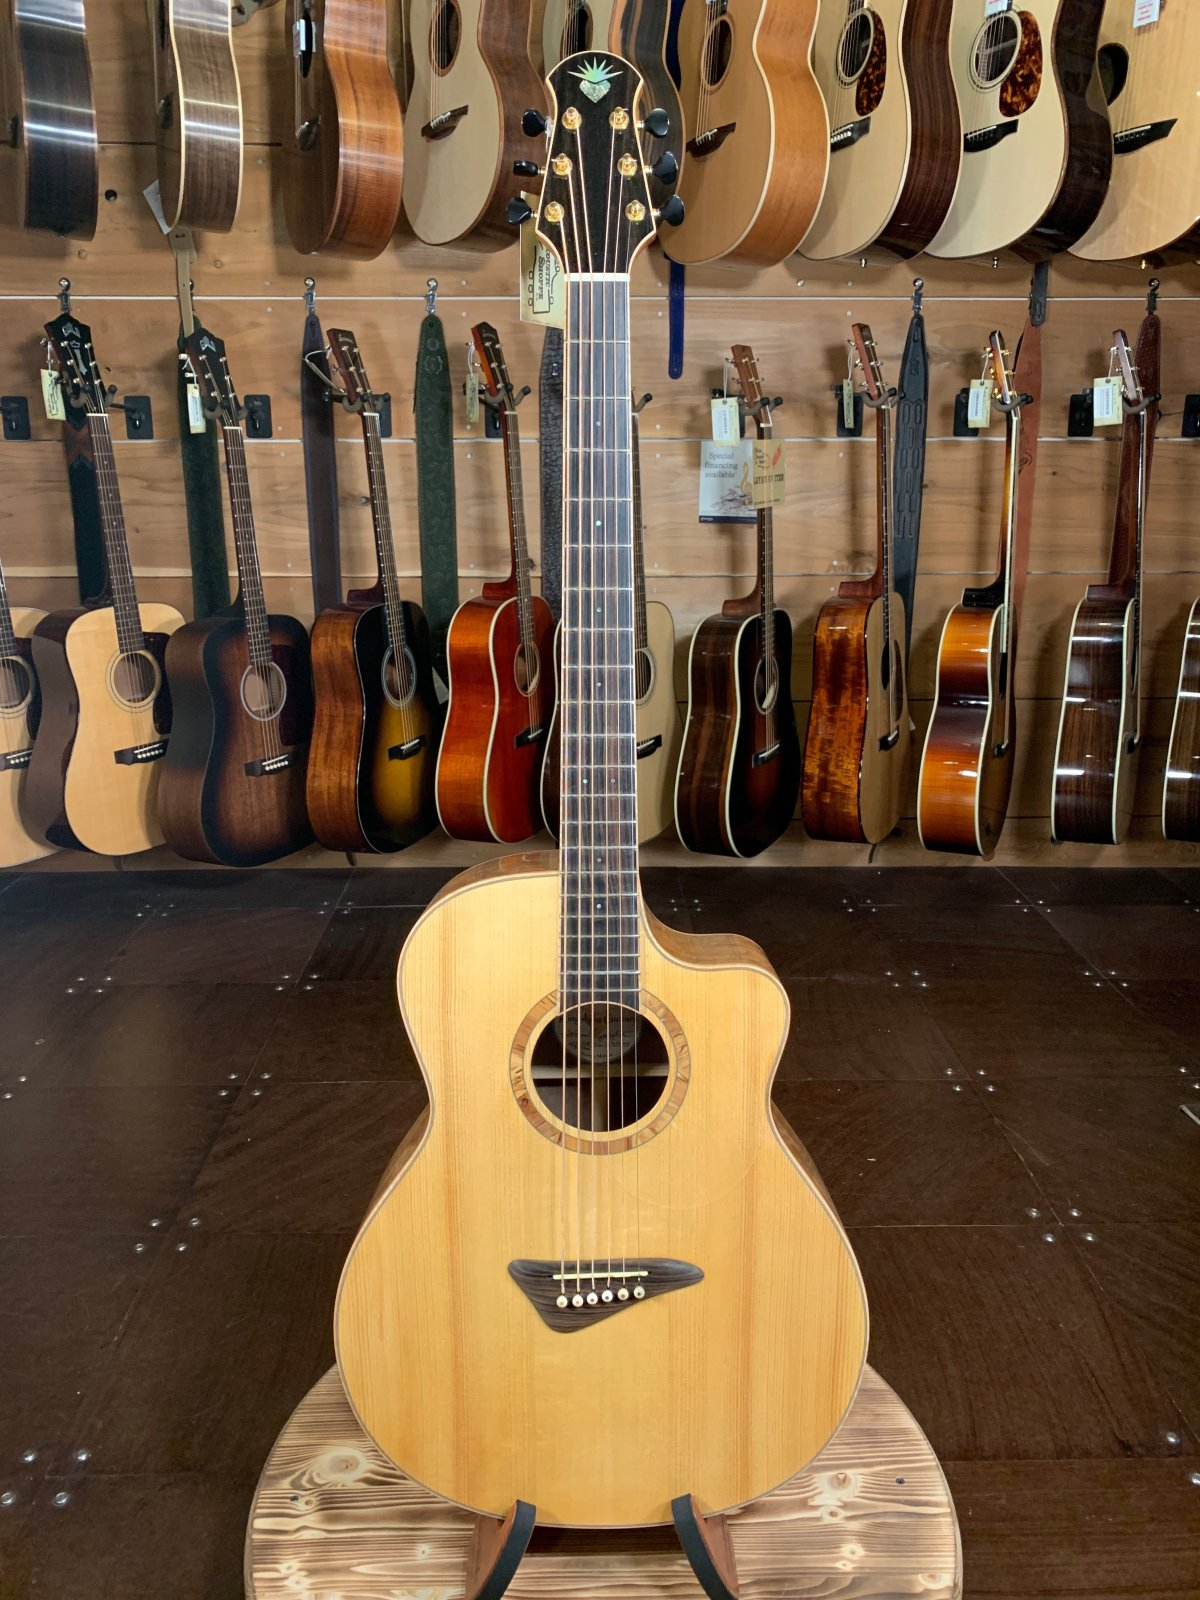 (Used) Kingslight Baritone Guitar JCB #23